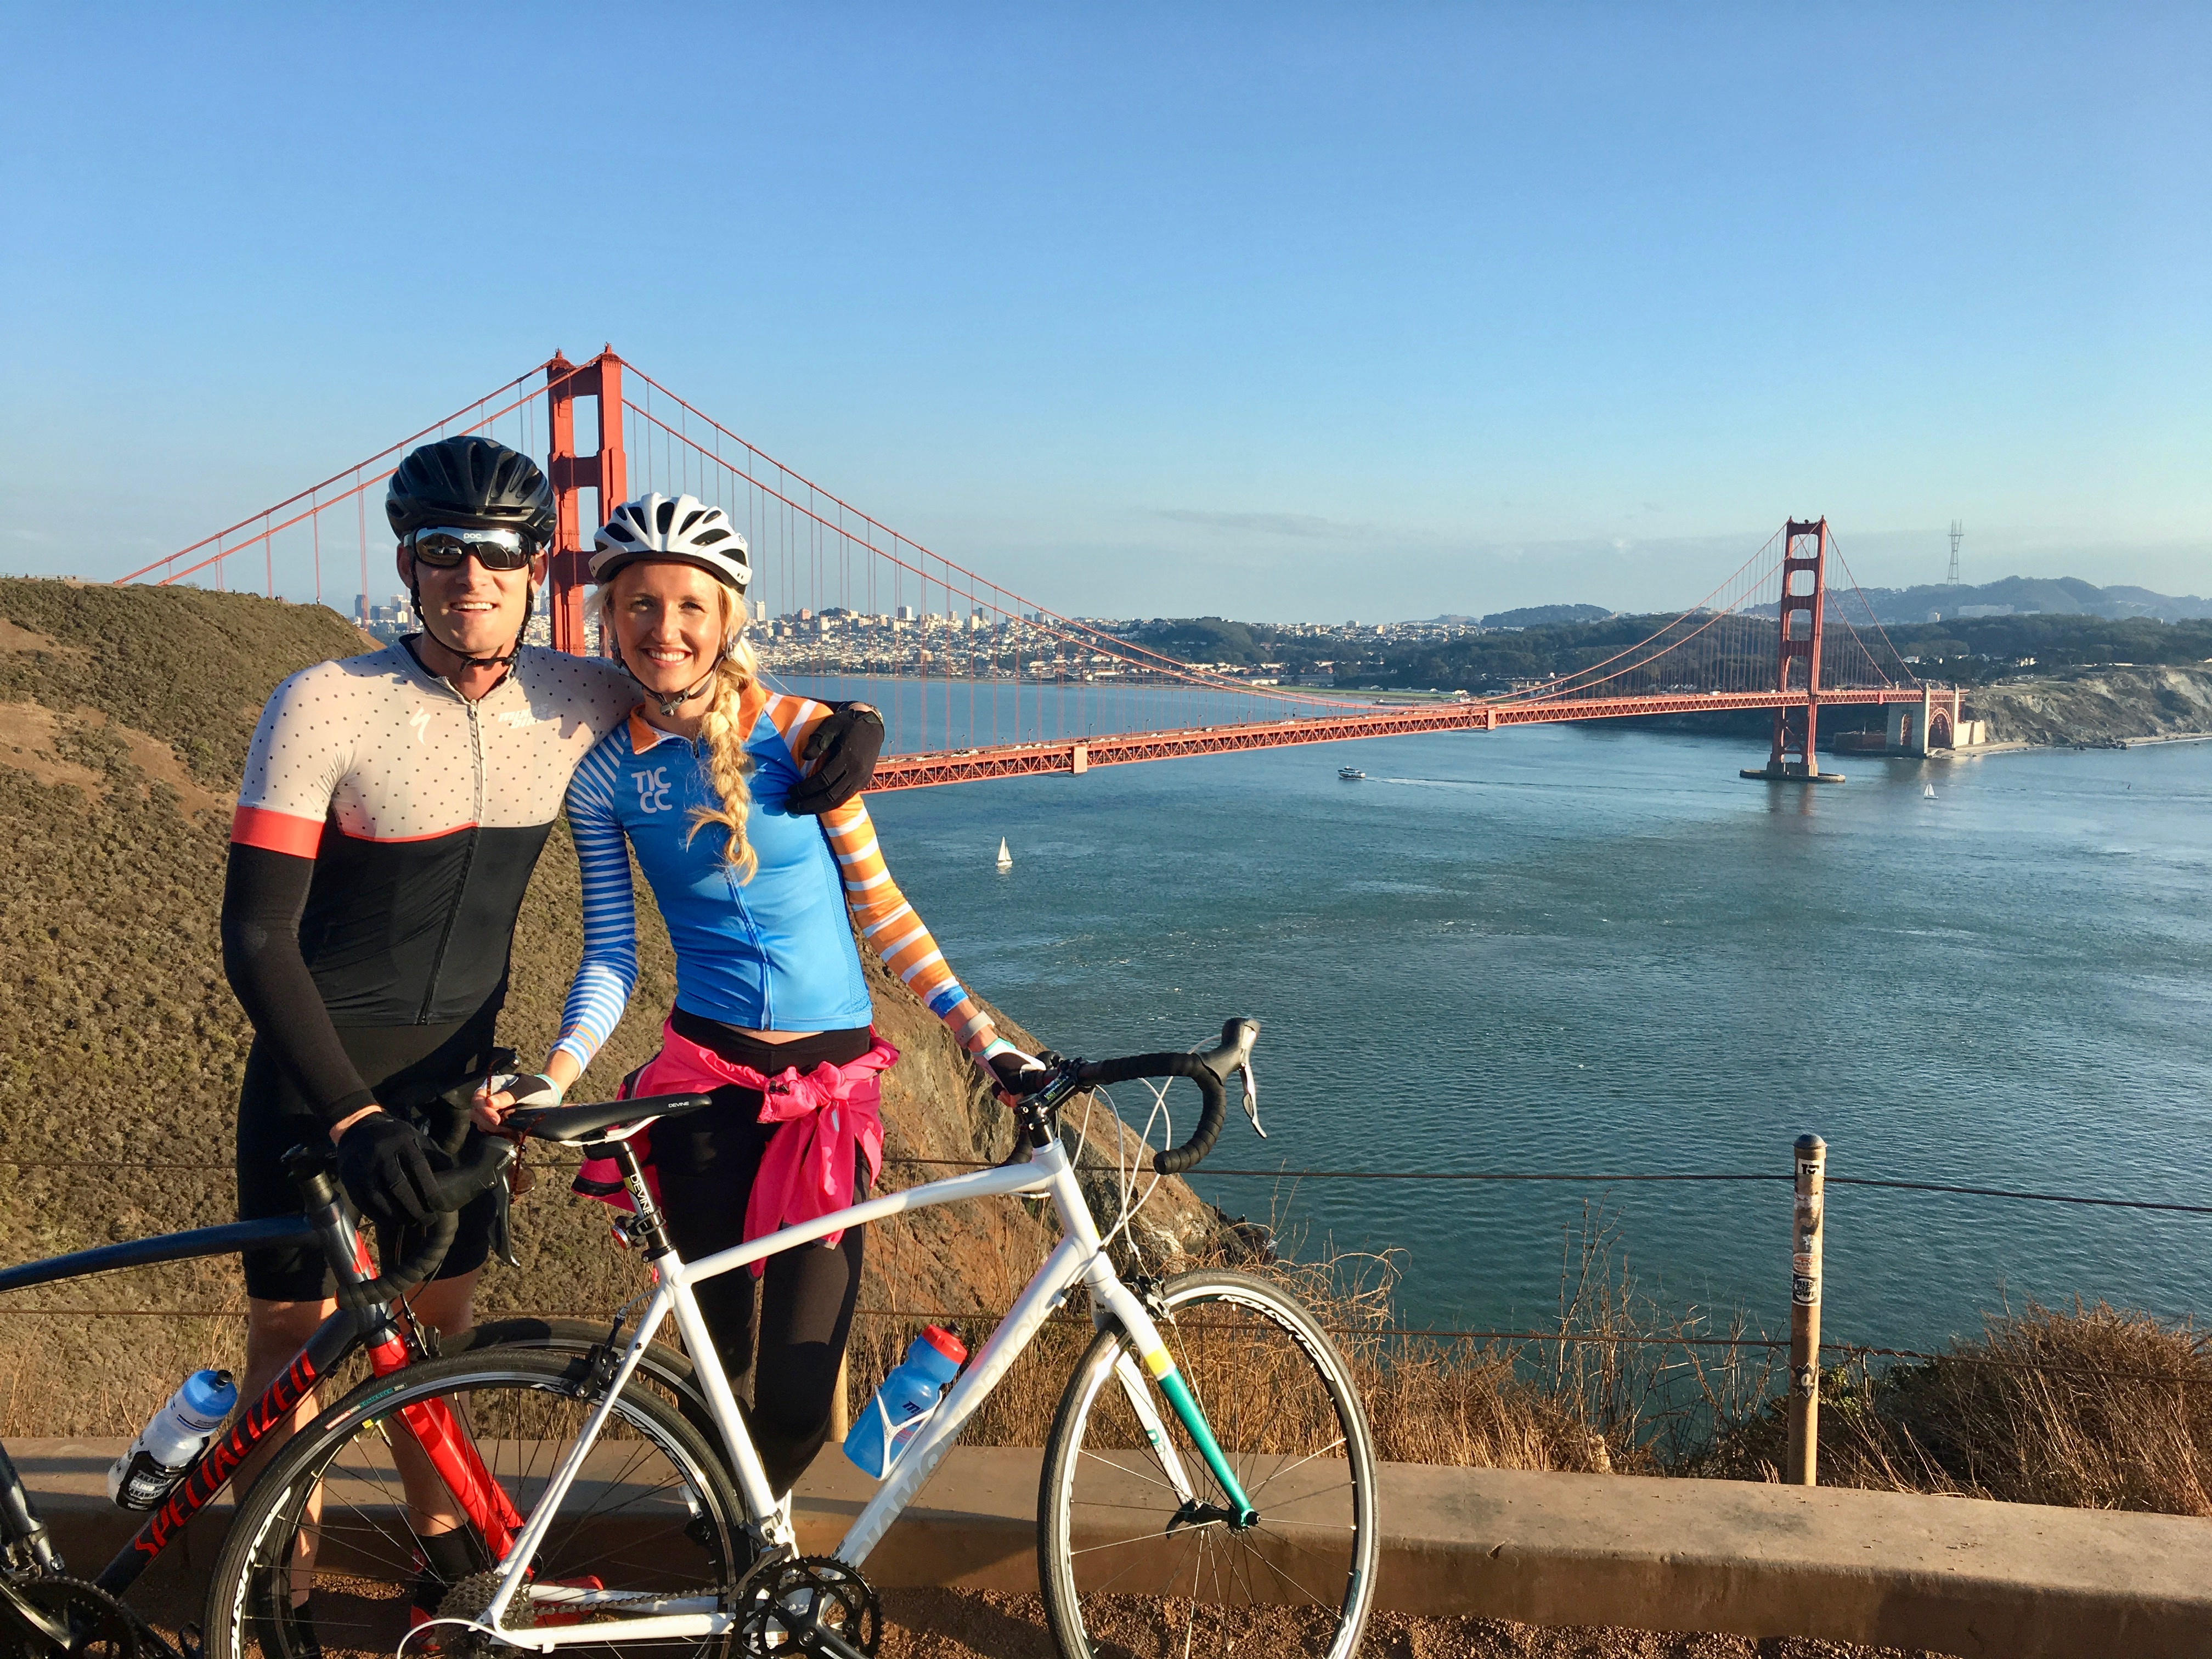 Biking the bridge + Dinner on the Pier + a Show!